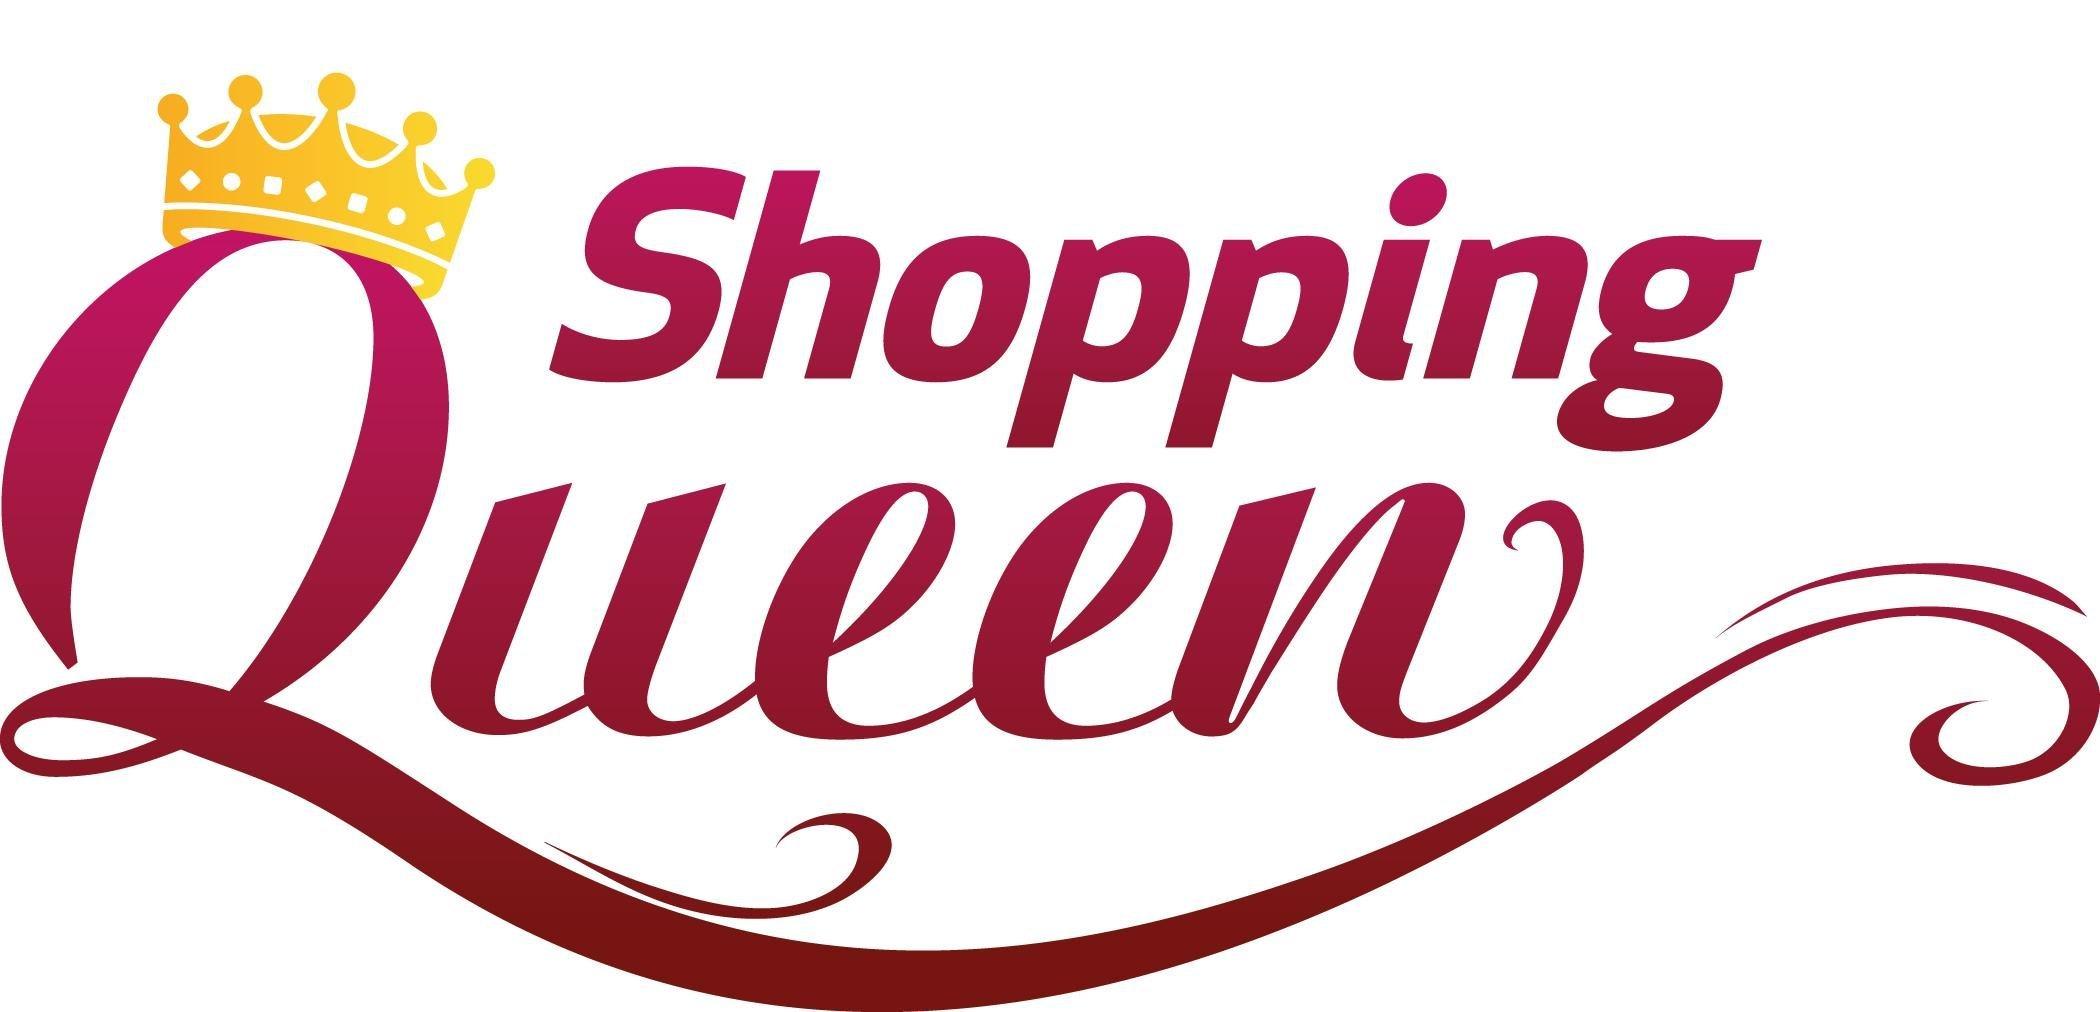 Lurch 86405 Shopping Queen Keksstempel Set 6-teilig Silikon, rosa: Amazon.de: Küche & Haushalt